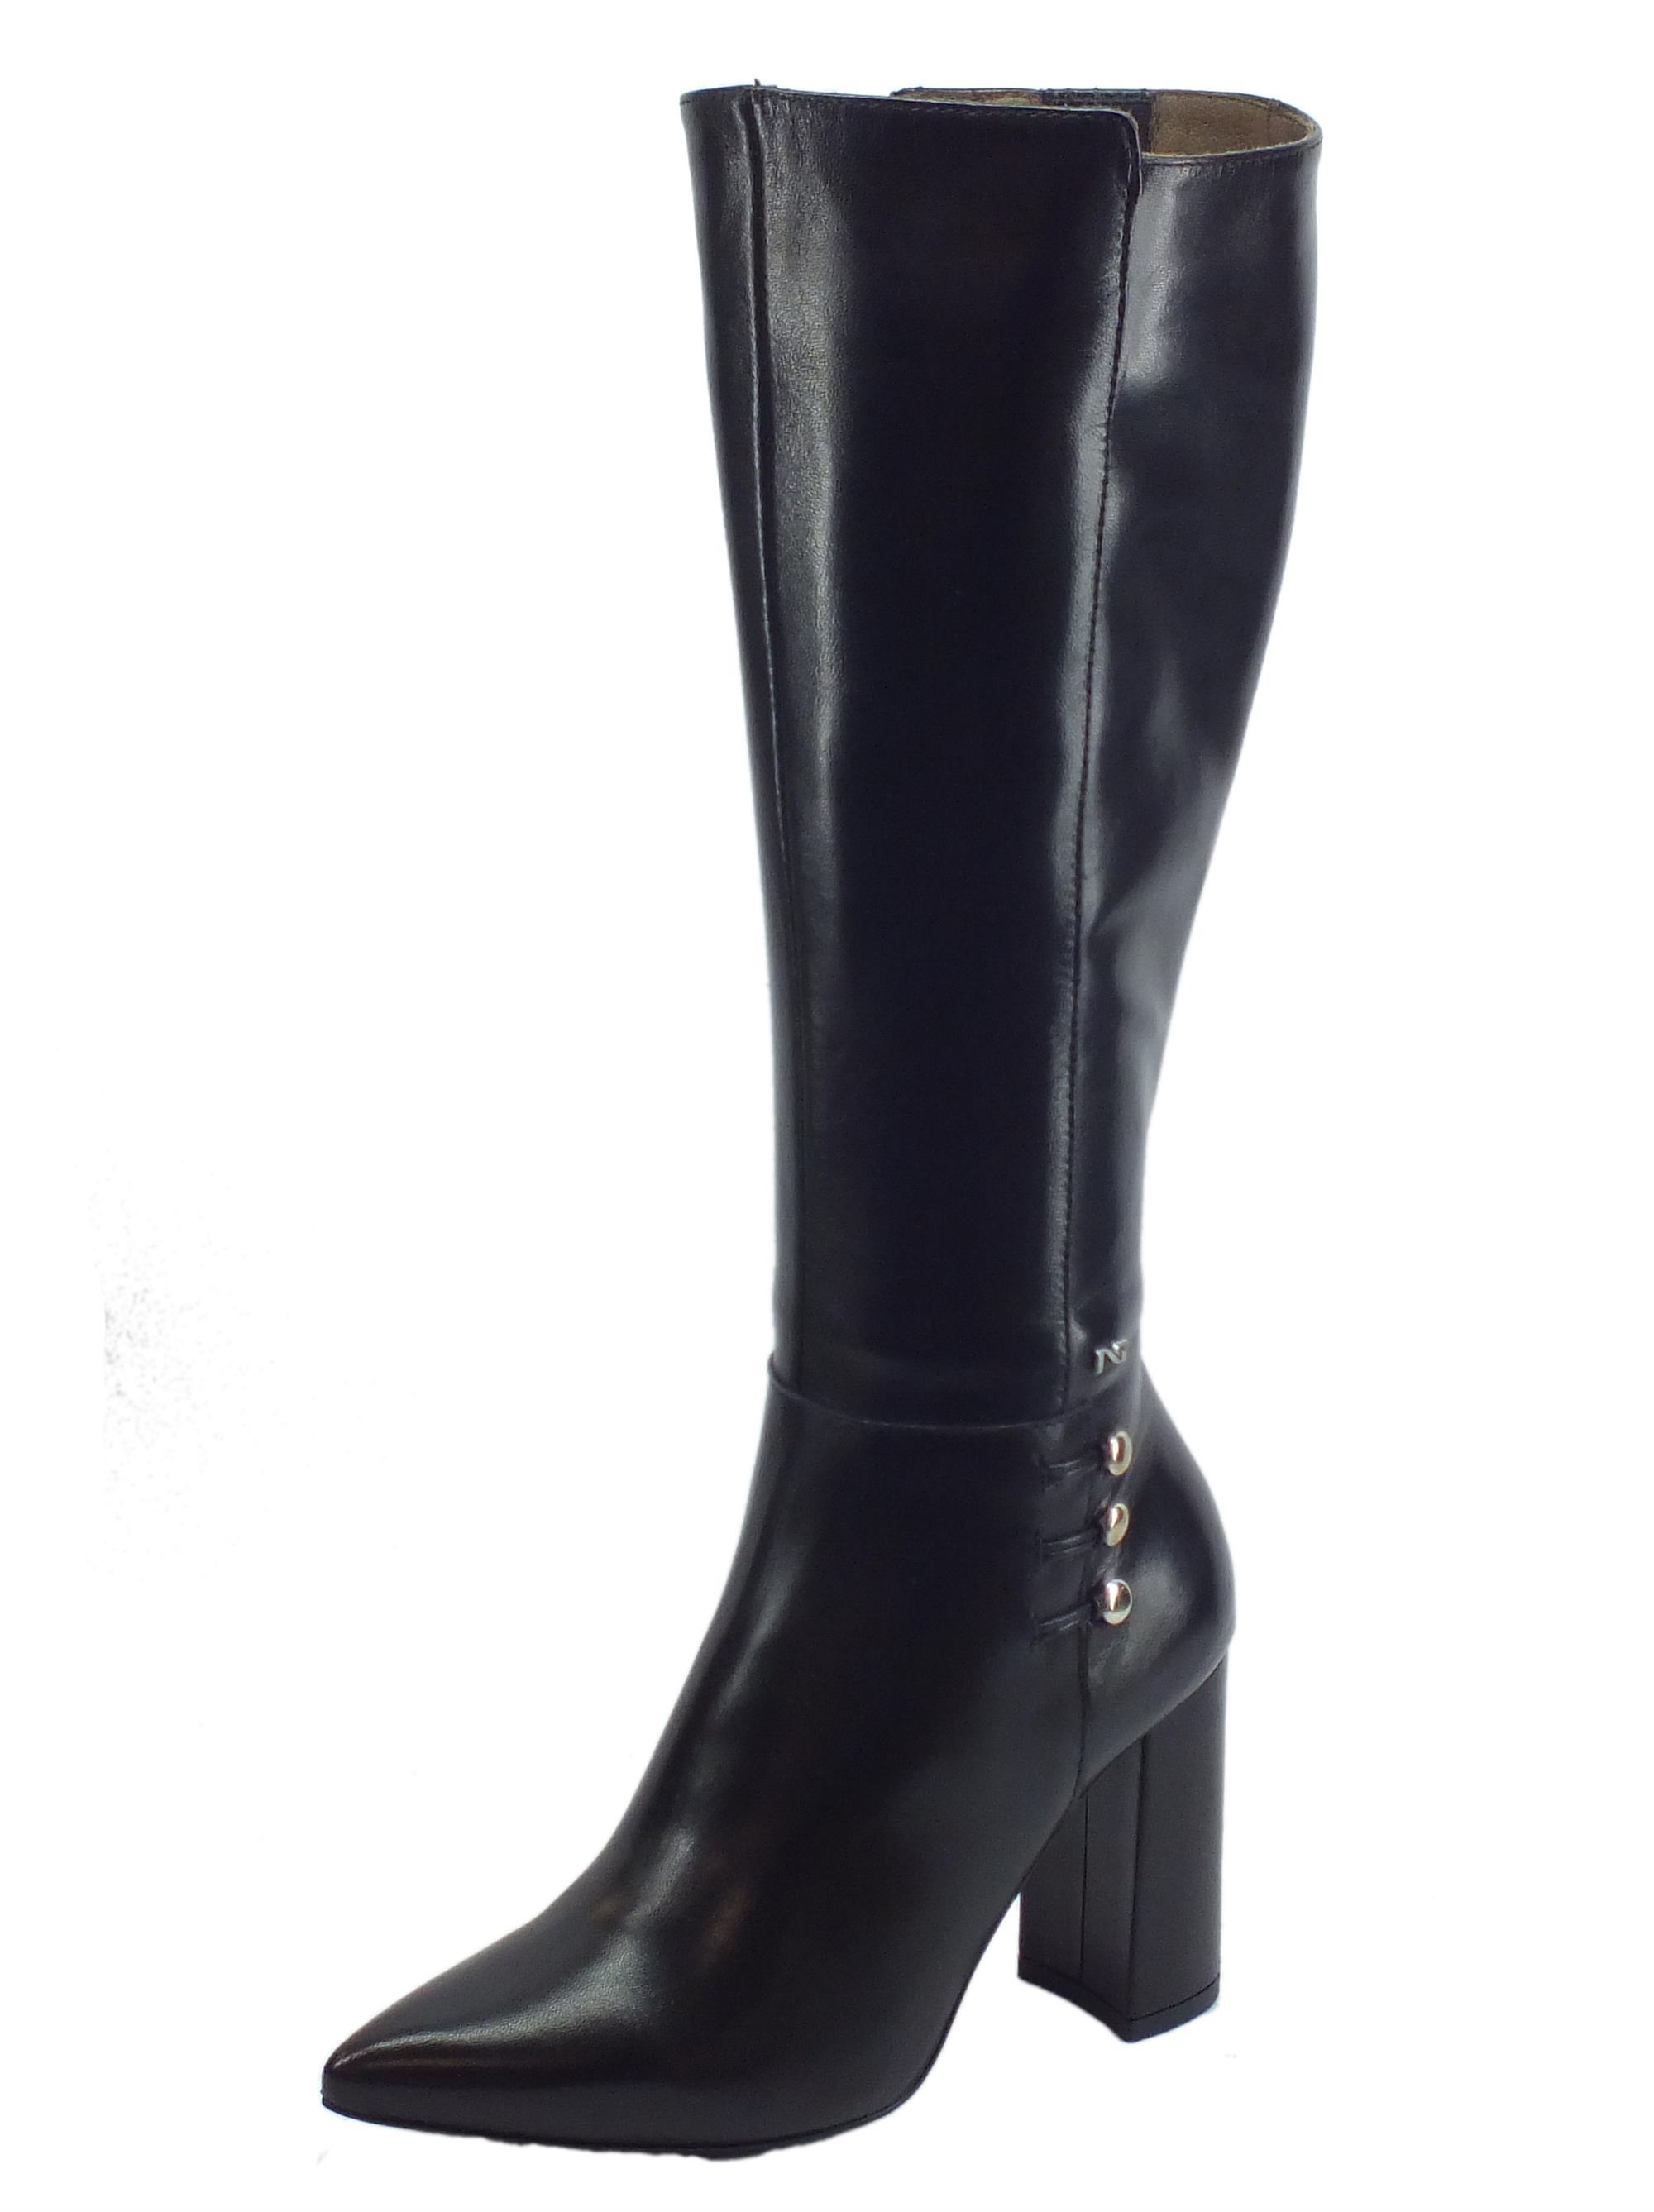 Stivali a punta eleganti NeroGiardini pelle nera tacco alto ... ef021d01ab5